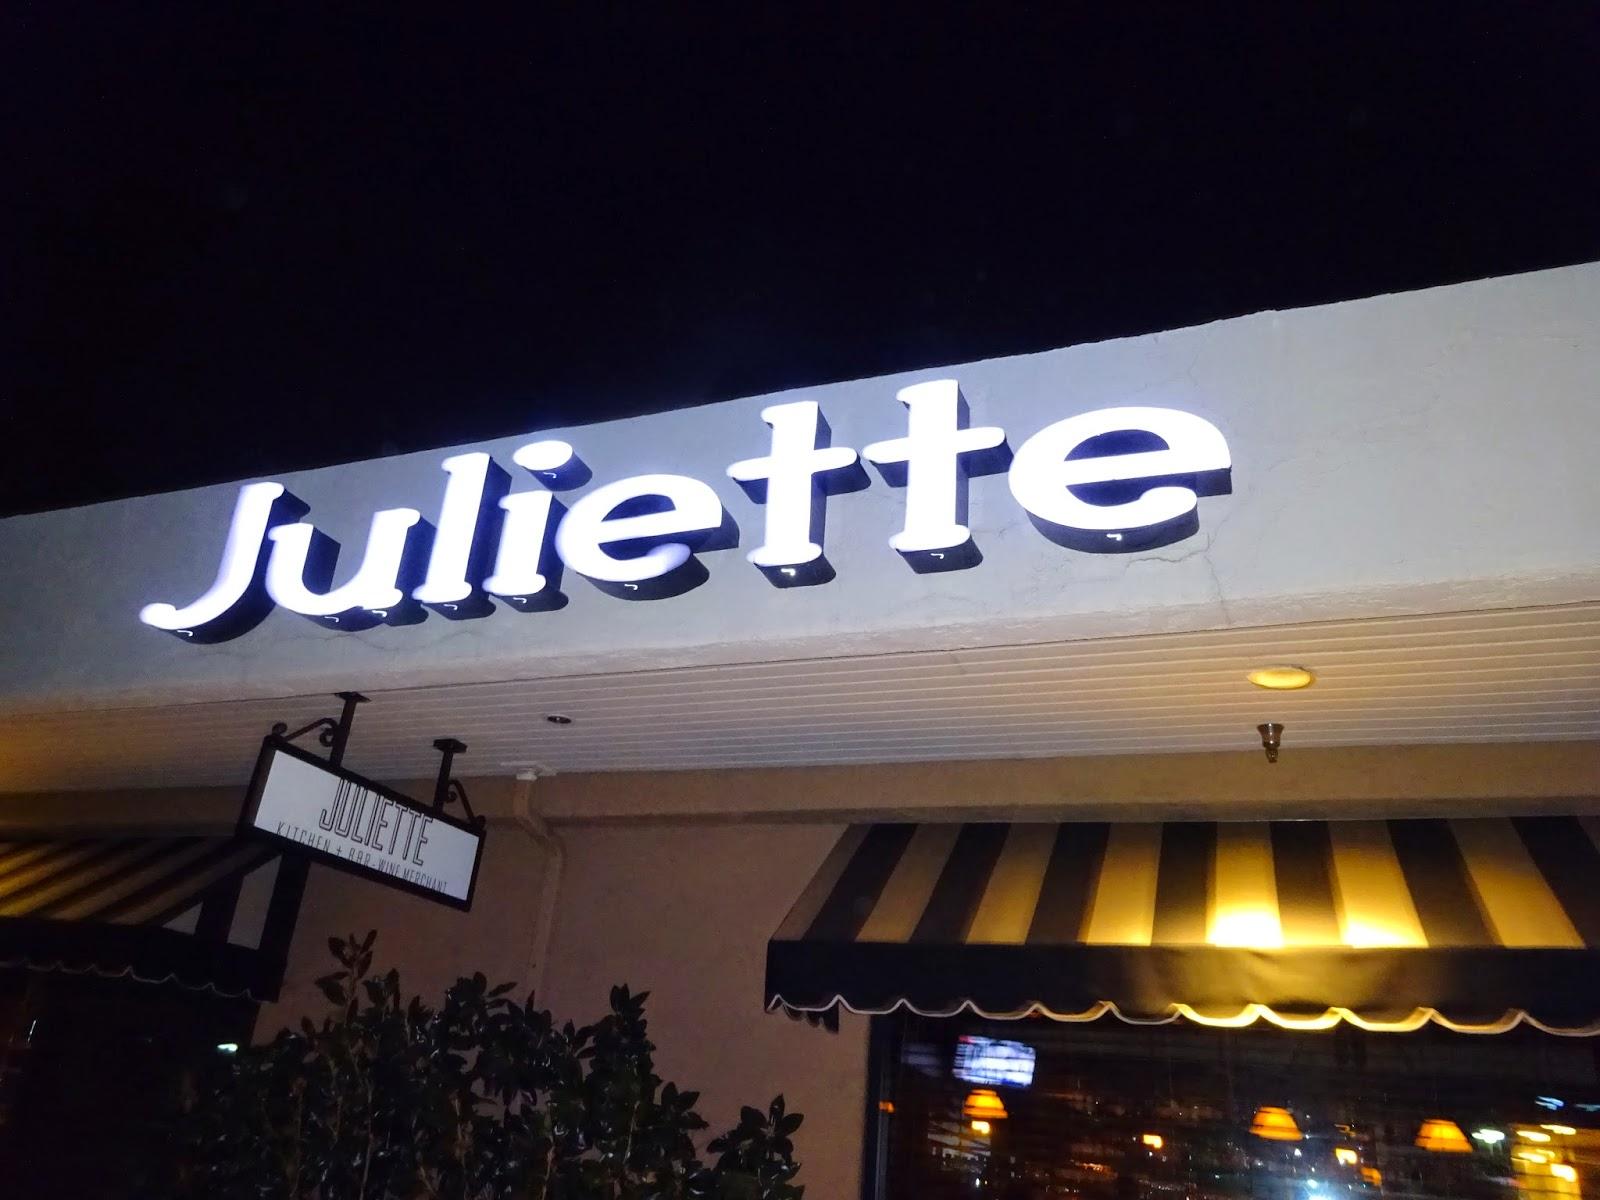 Eating My Way Through Oc Romantic Date Night At Juliette